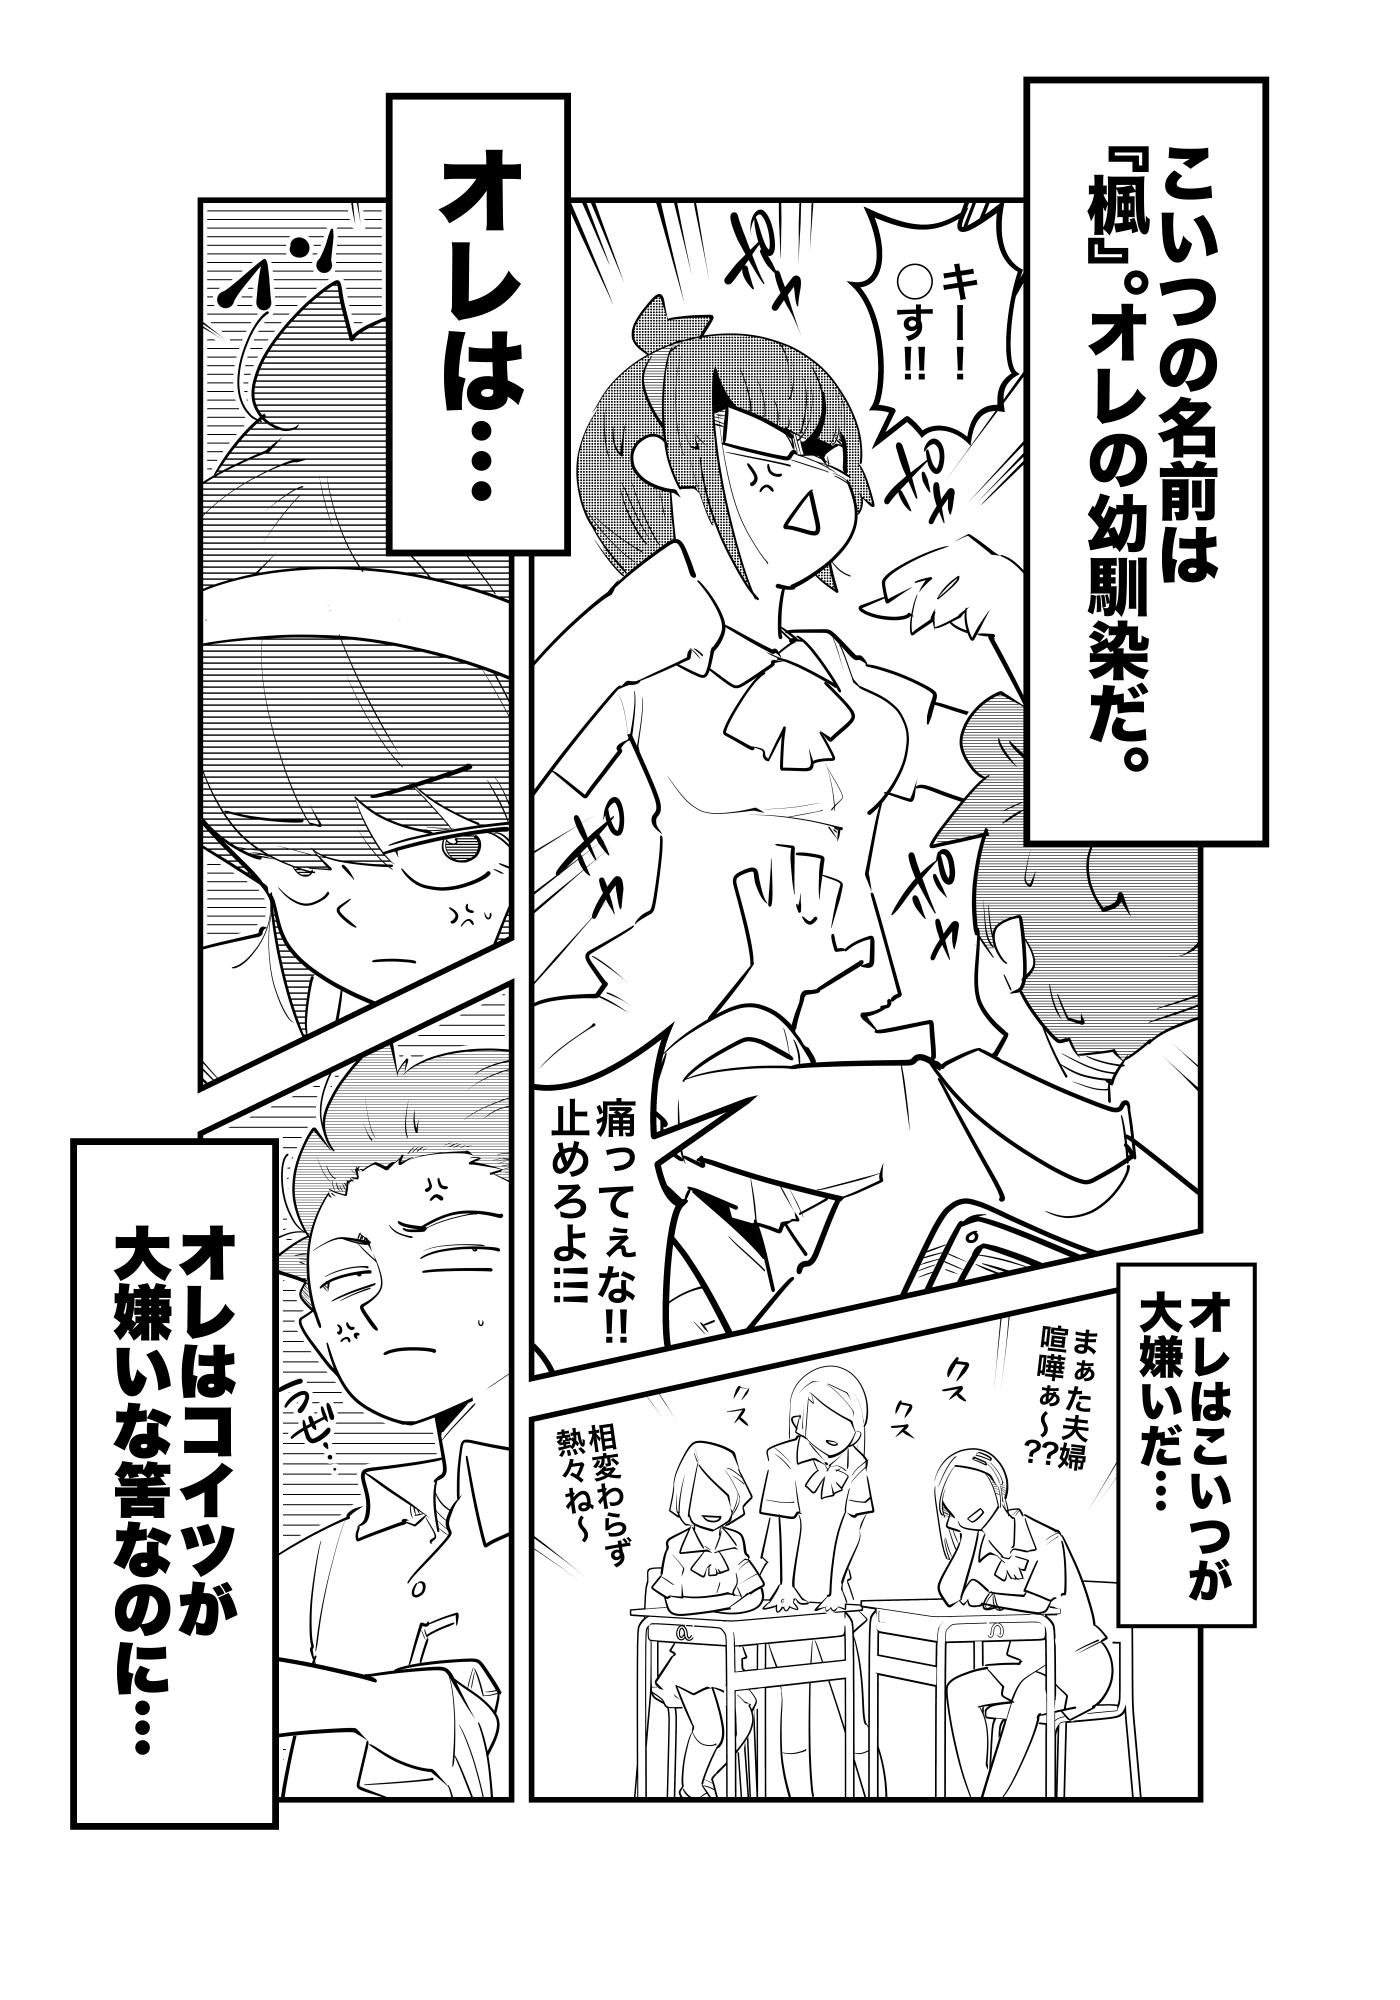 f:id:terashimaru117:20210915015256p:plain